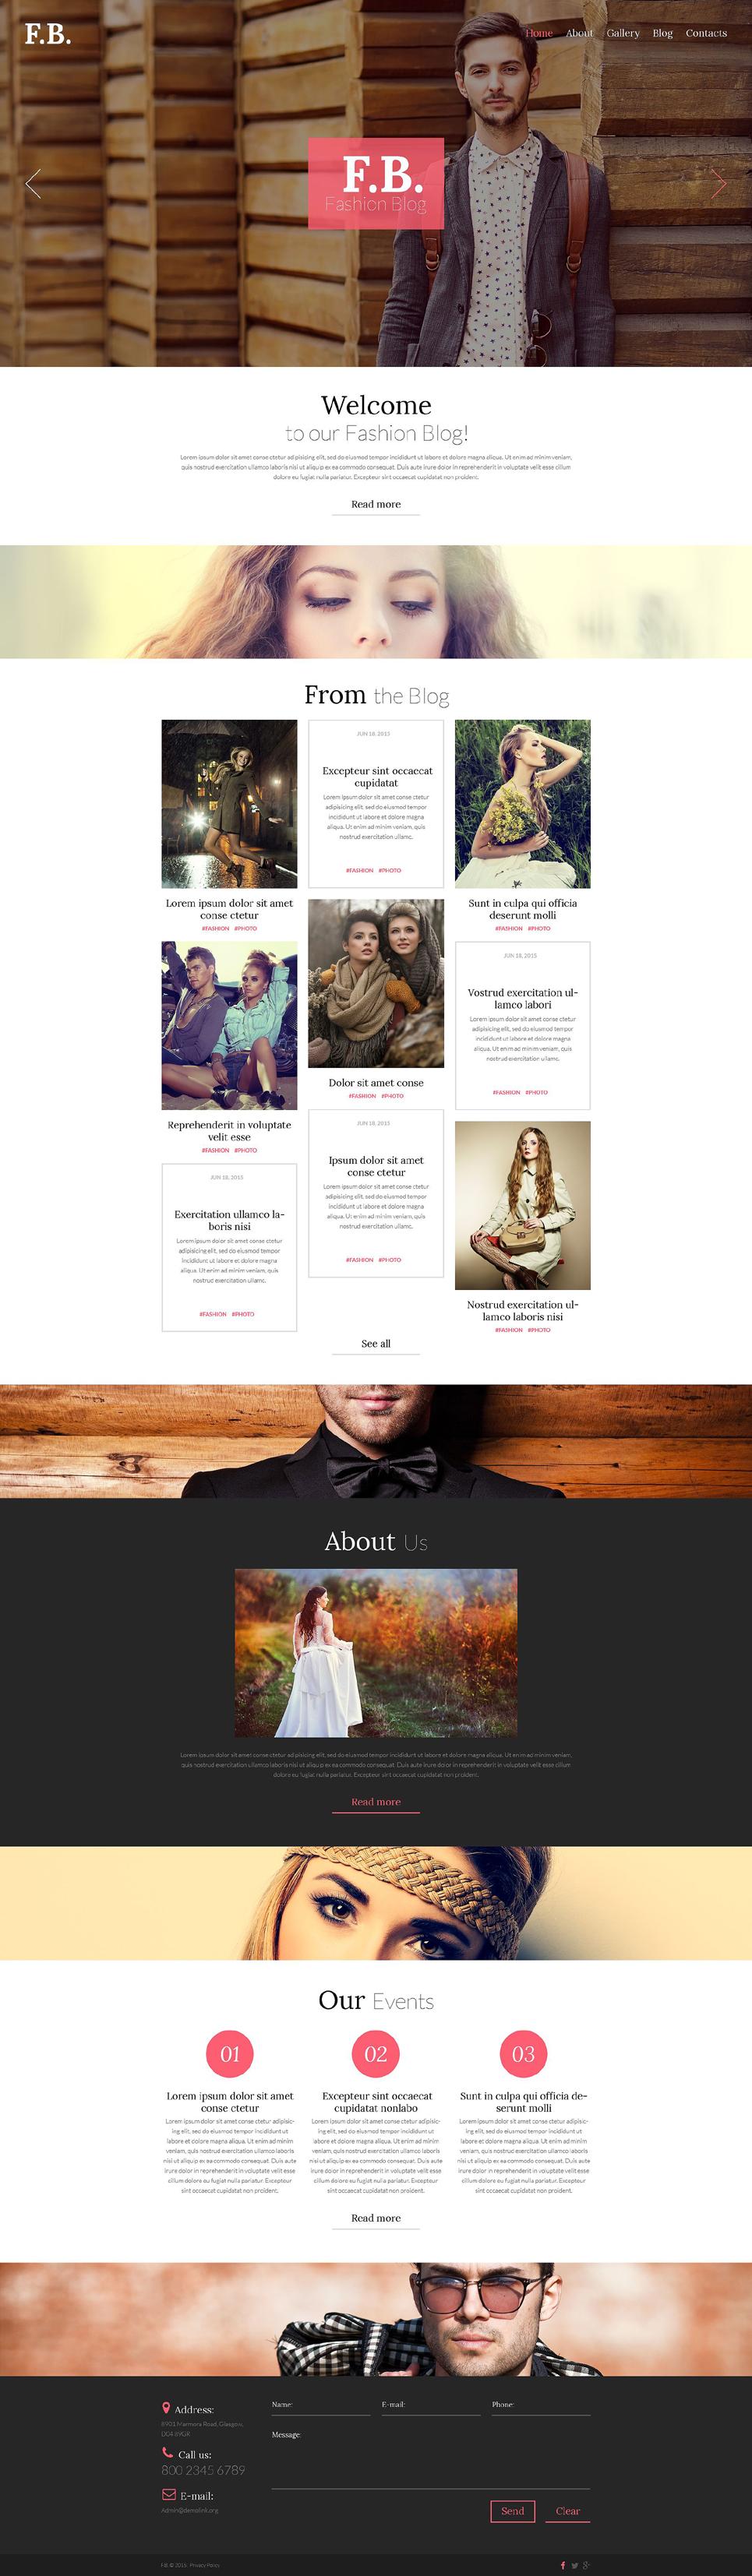 Адаптивный шаблон сайта на тему блог о моде #53435